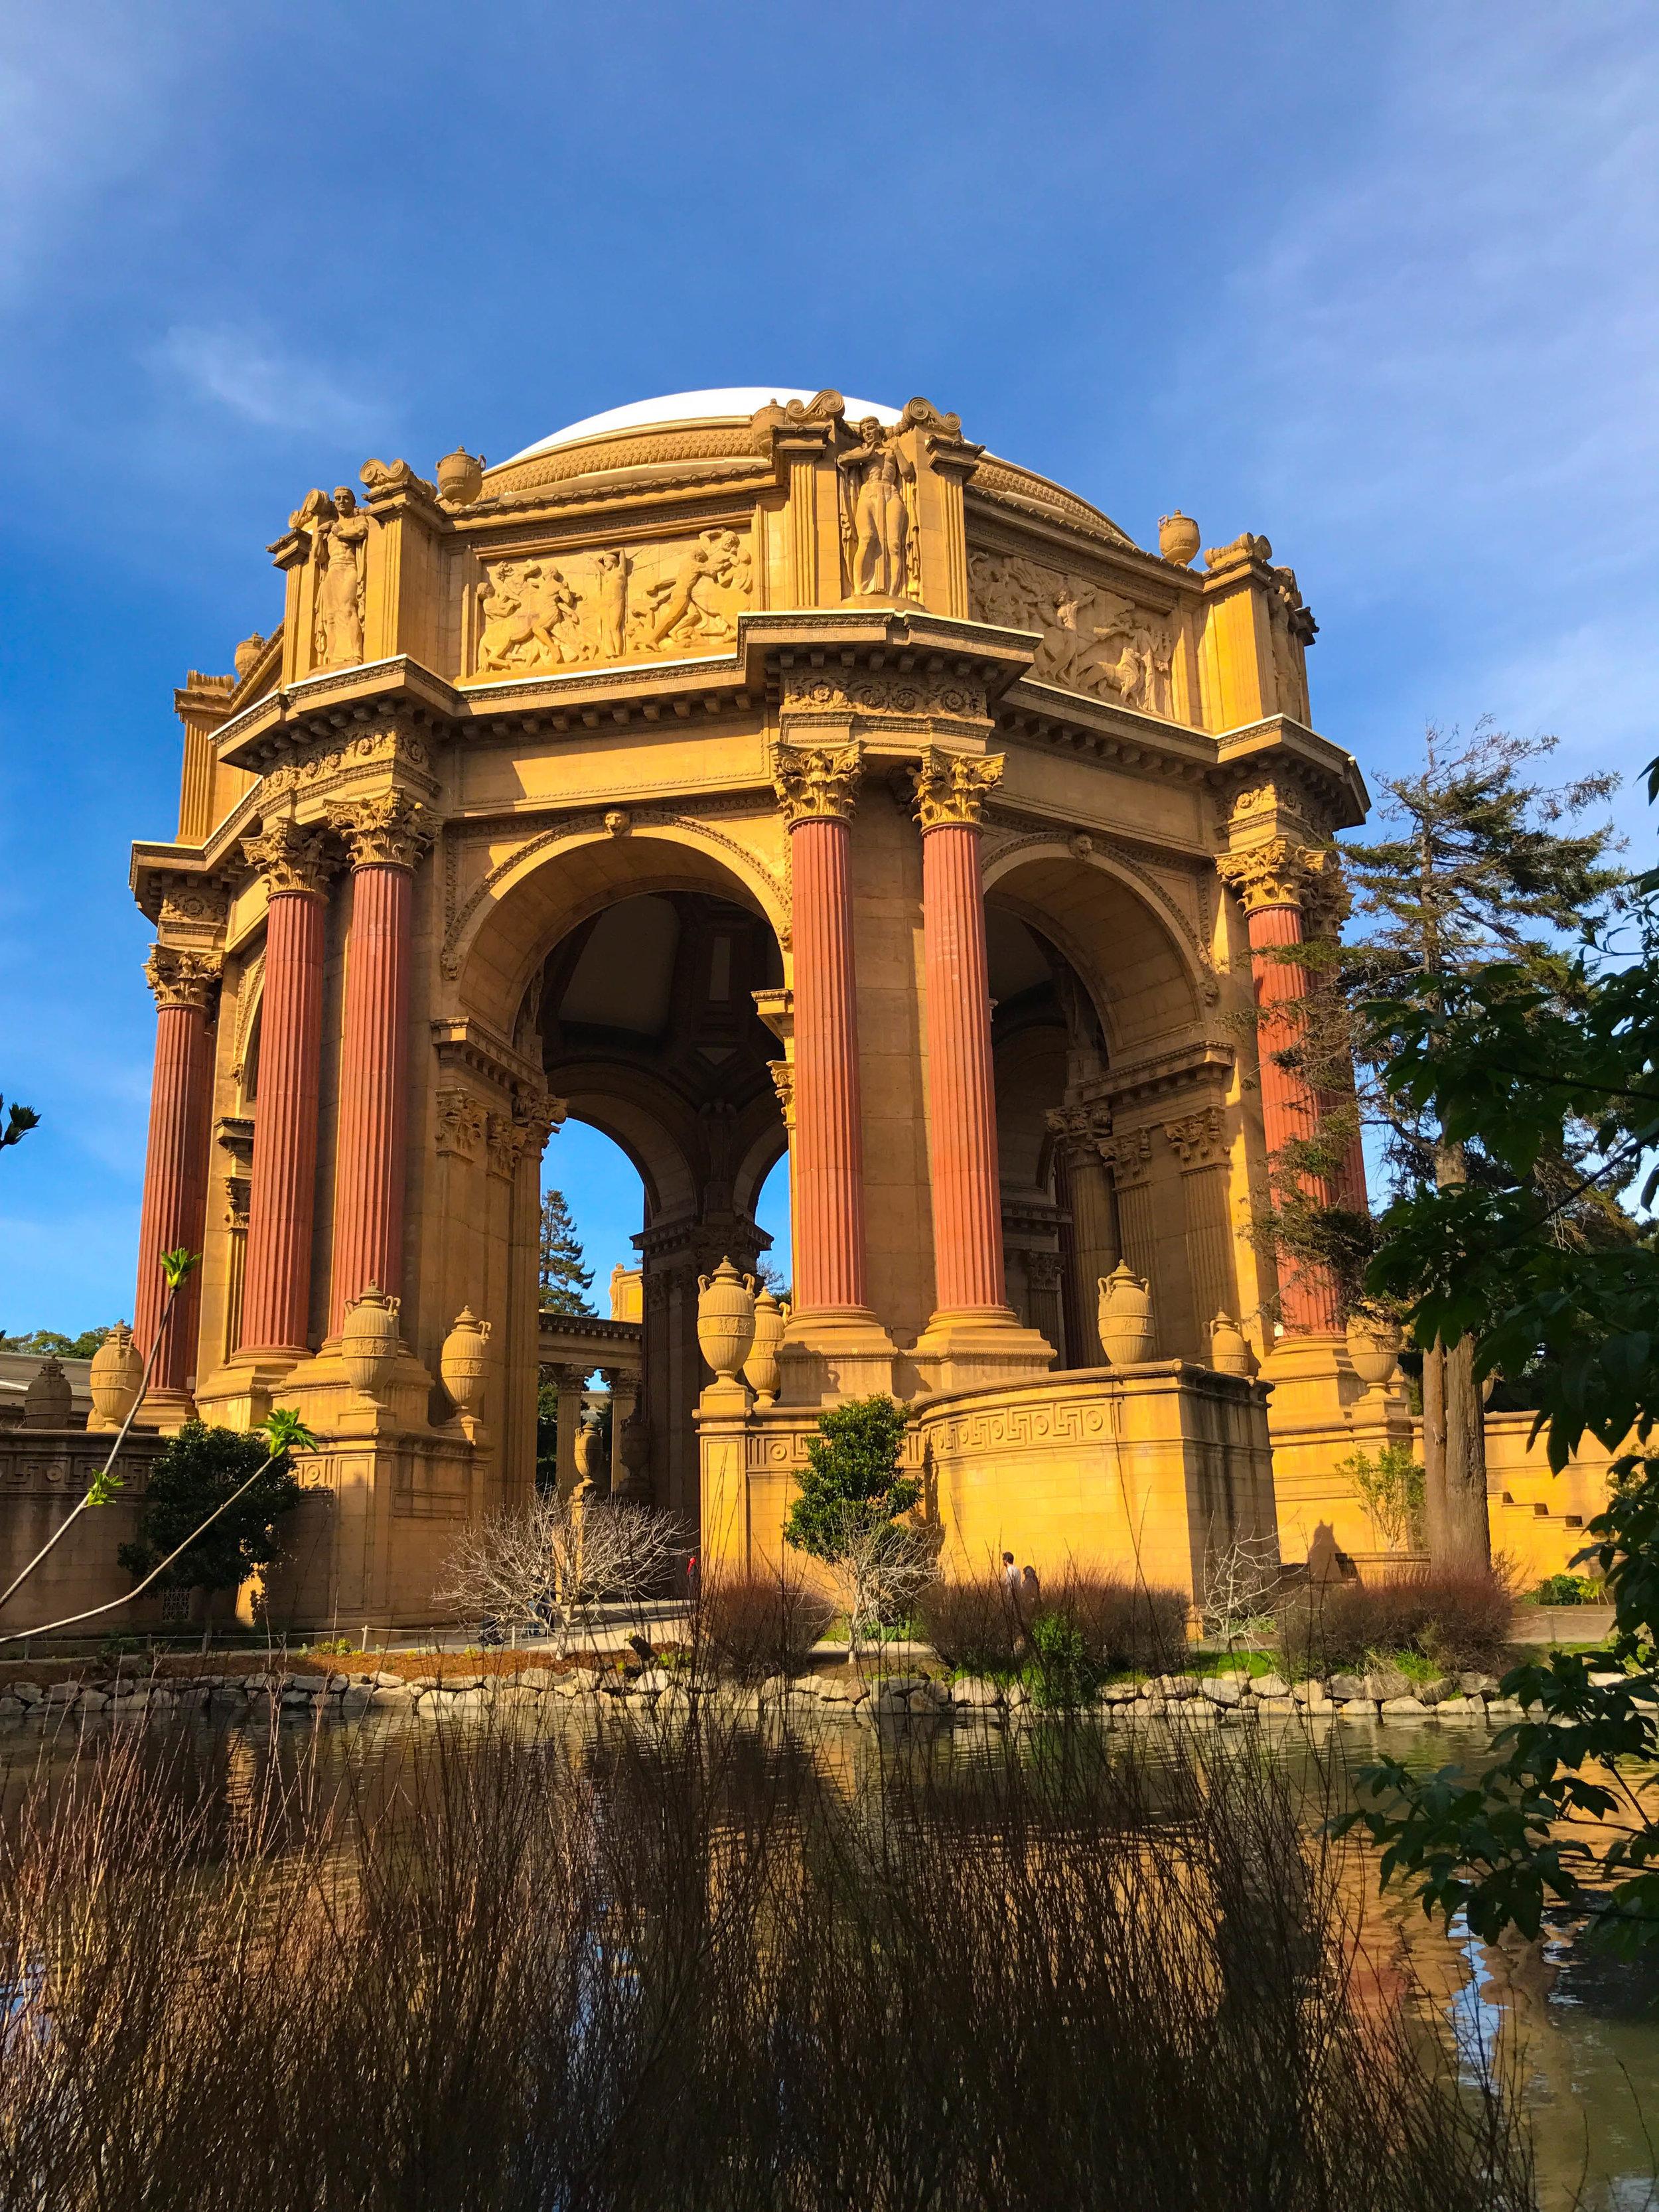 San_Francisco-Palace_of_fine_arts.jpg